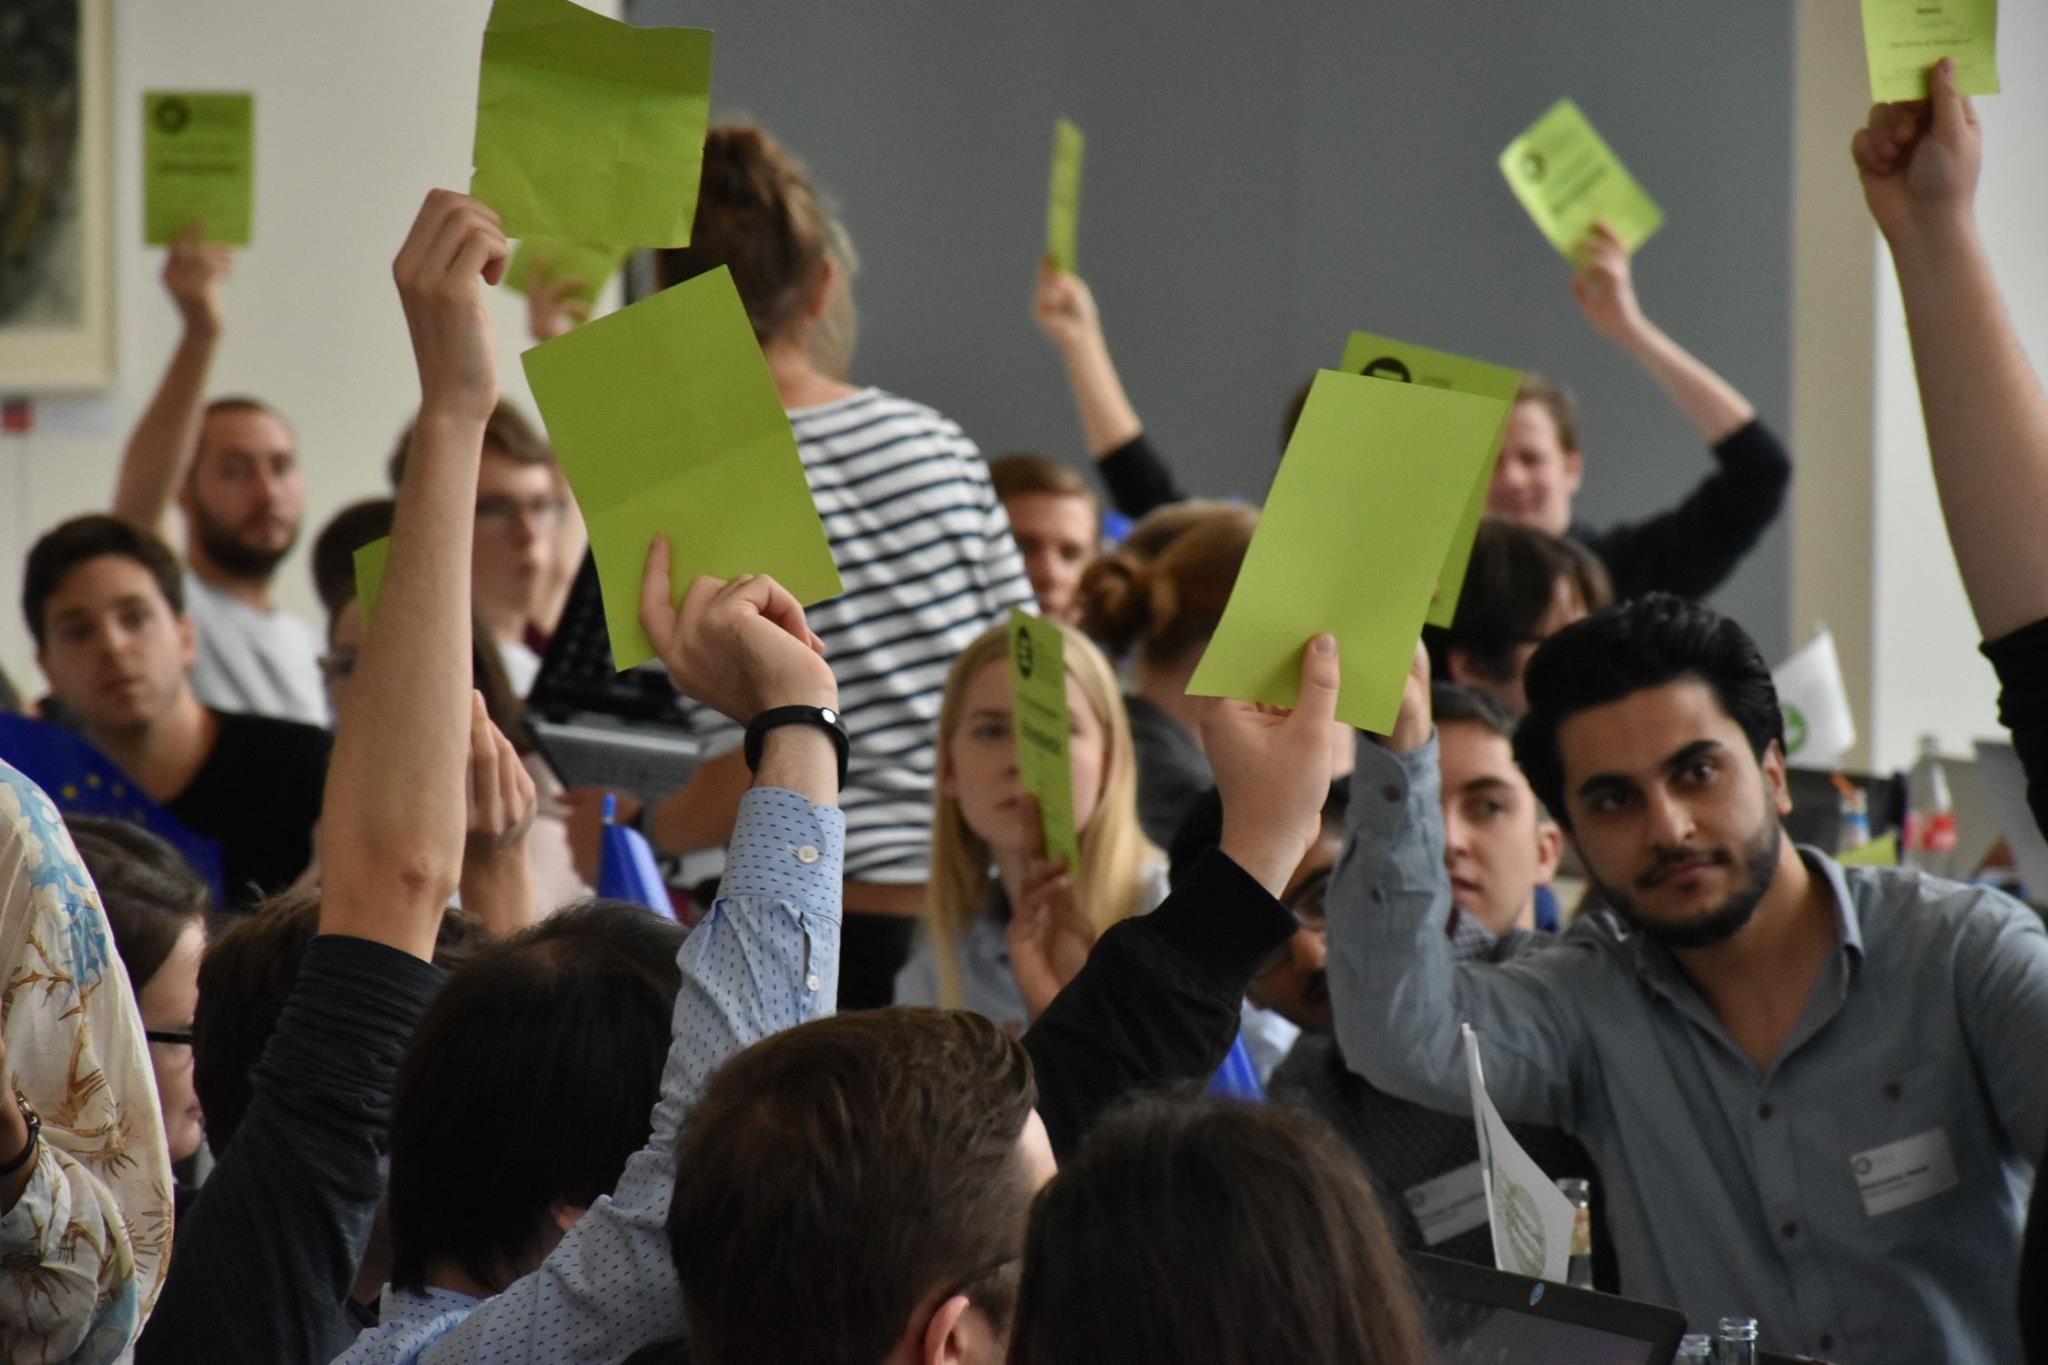 Europa denn man tau! – Drei Tage, 23 Anträge, 120 Delegierte